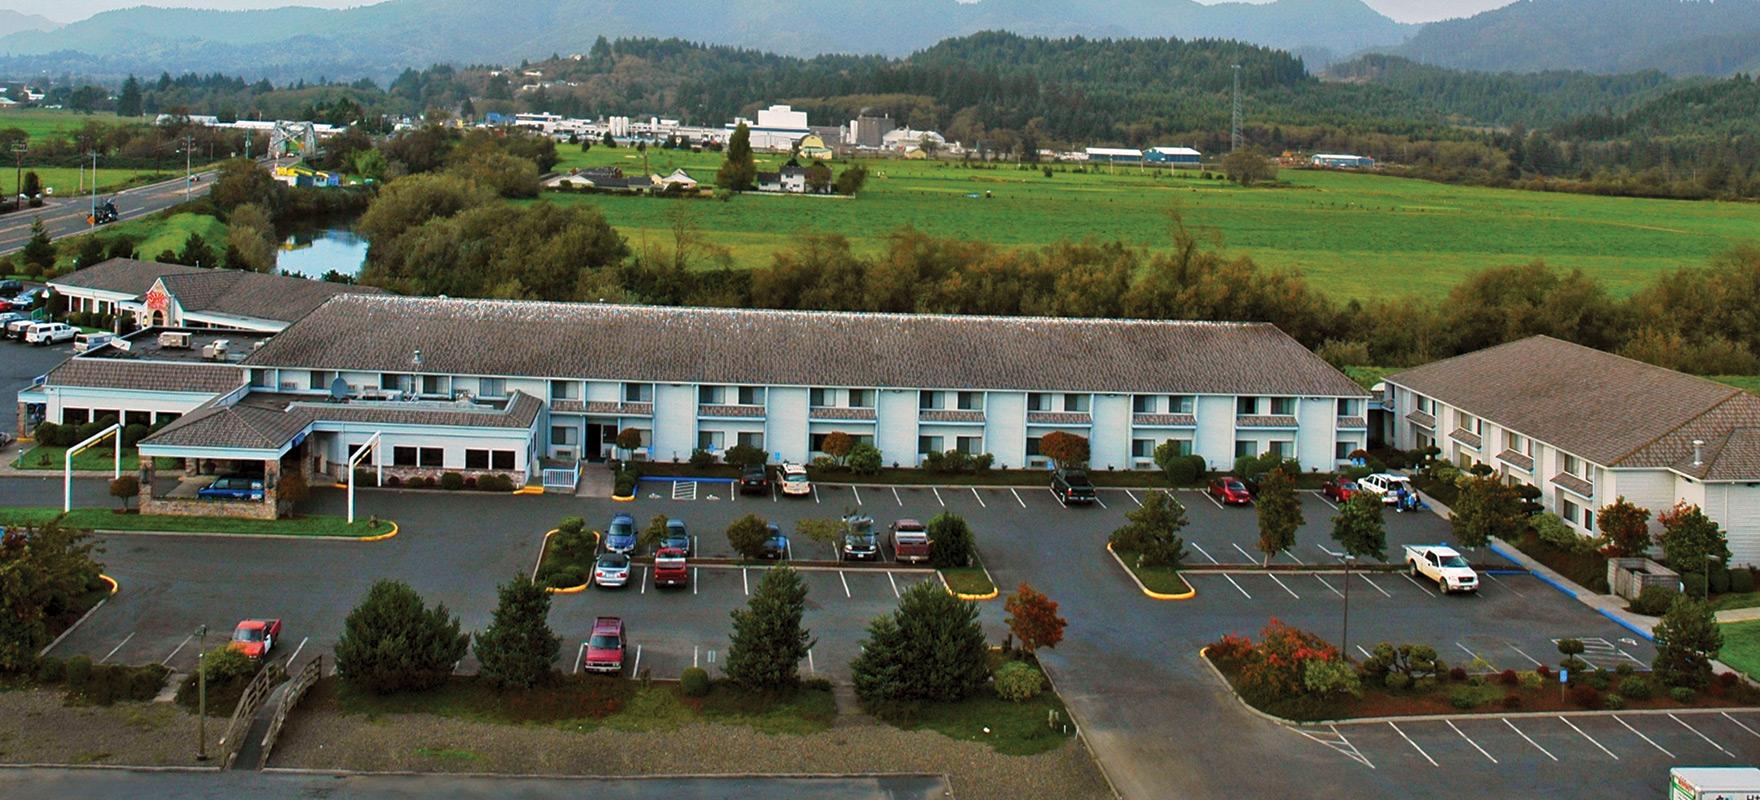 Shilo Inns Suites Hotels Tillamook Oregon